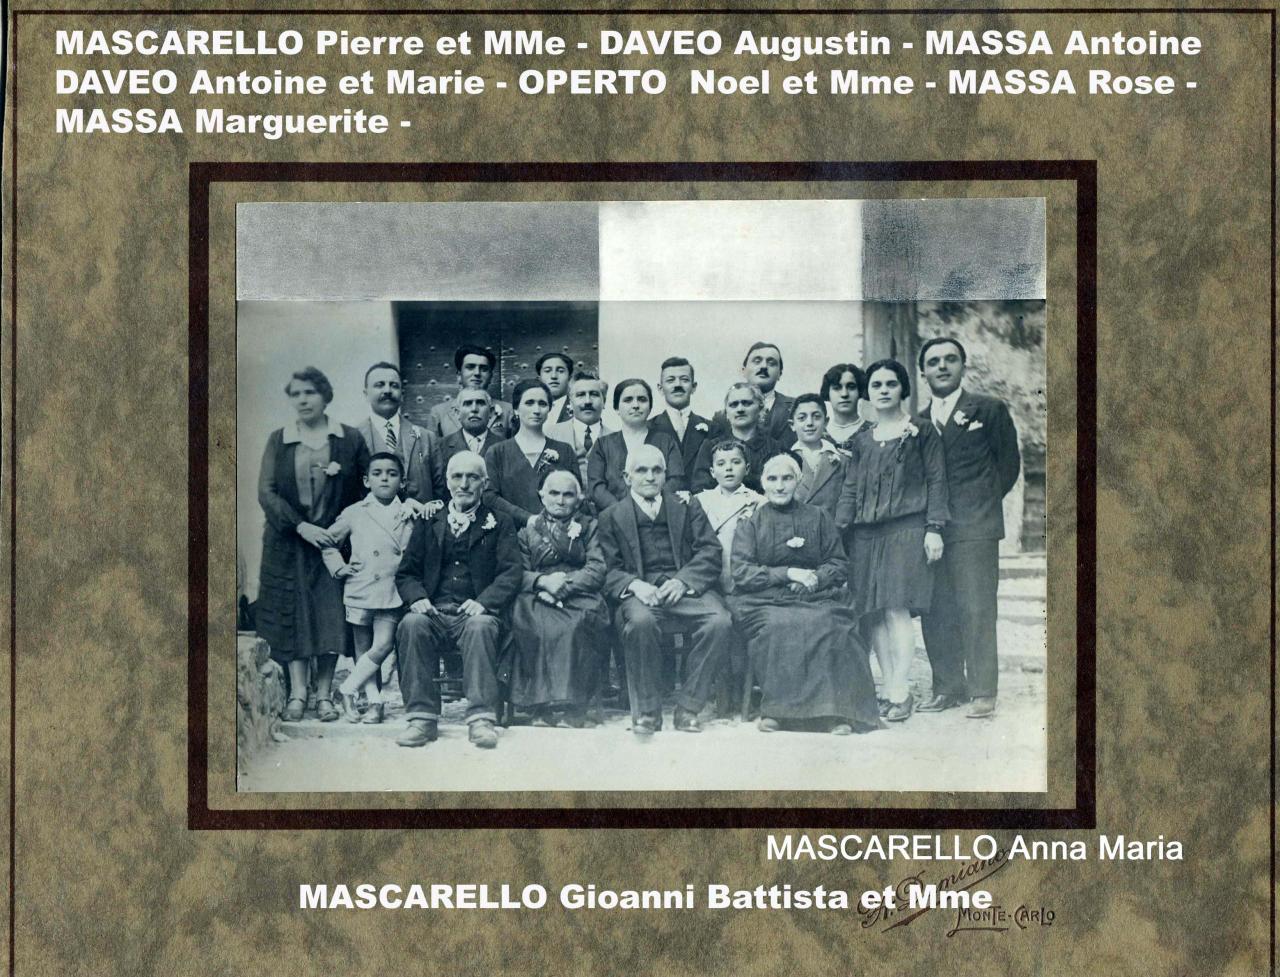 Familles DAVEO - MASCARELLO - MASSA - OPERTO